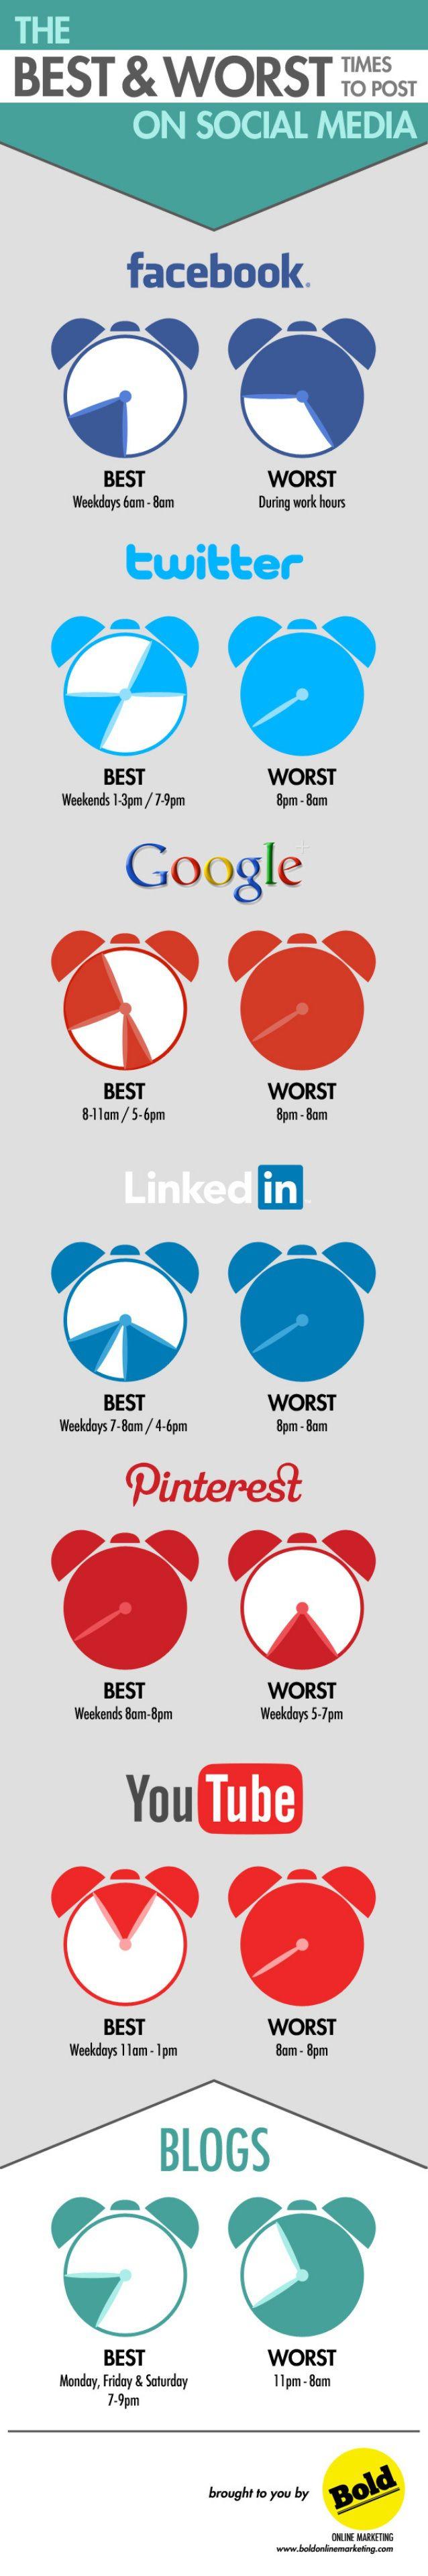 Social Media Posting Zeiten Infografik #socialmediapostingzeiten #socialmedia #sozialemedien #socialmediamarketing